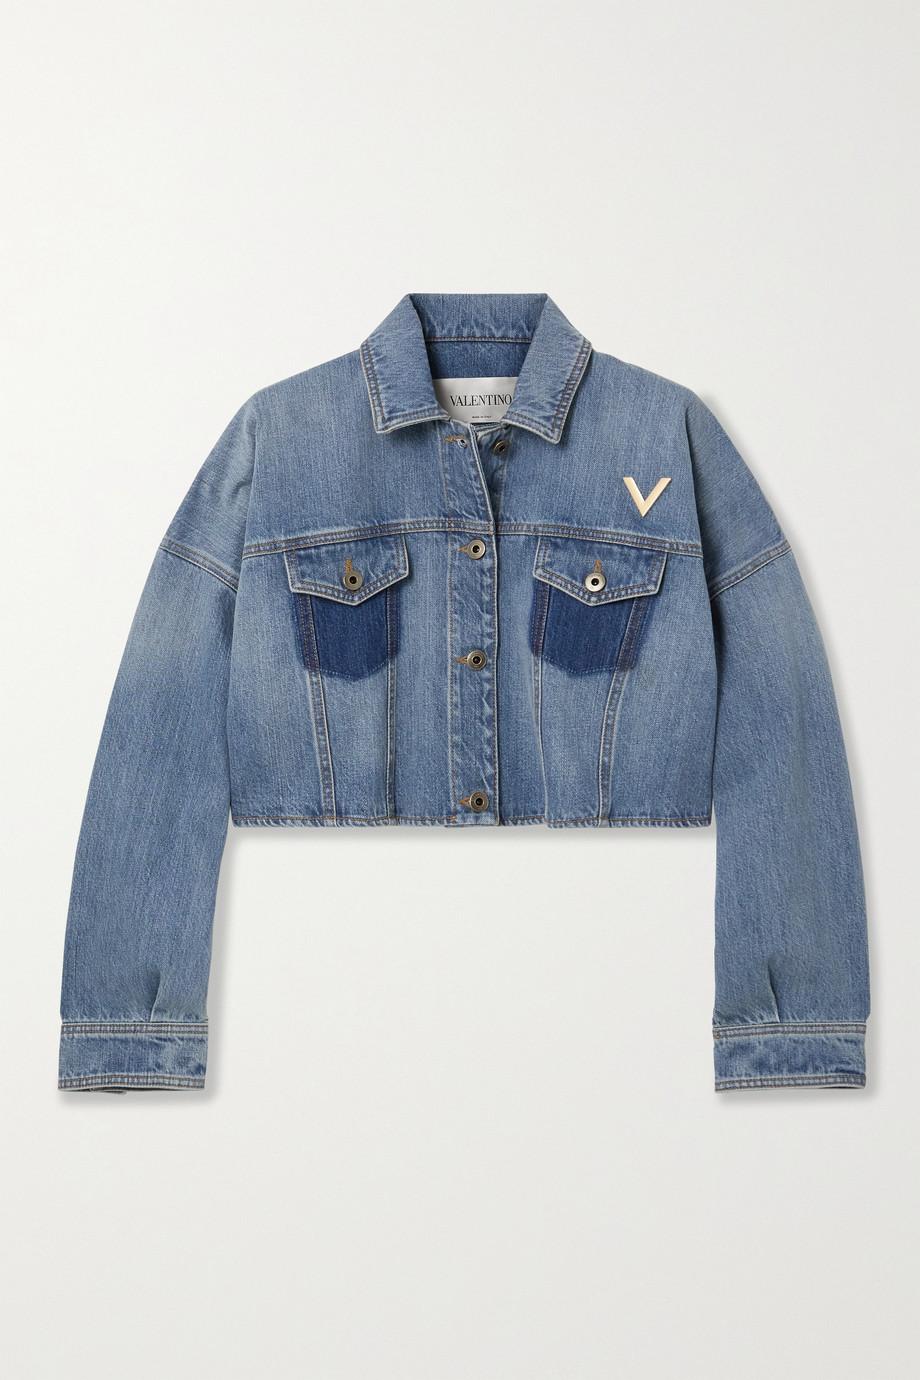 Valentino Embellished cropped denim jacket